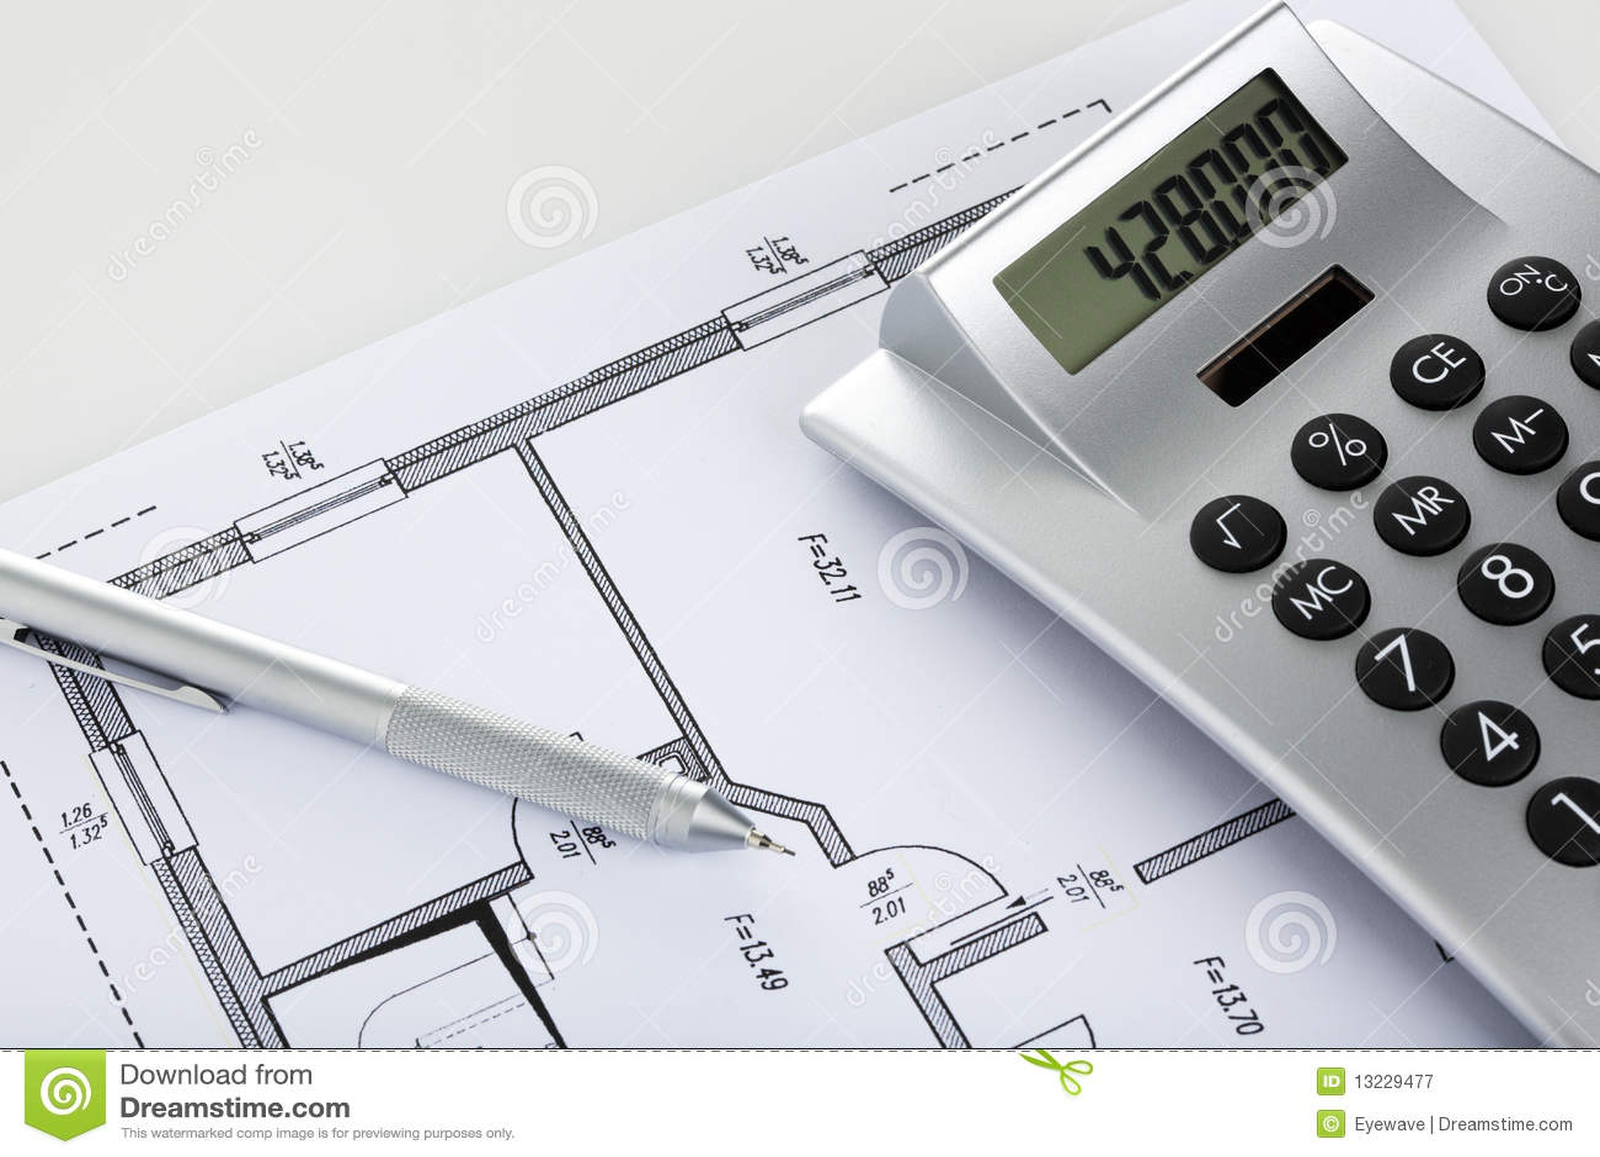 Pencil and calculator on blueprint of floor plan royalty for Blueprint estimator